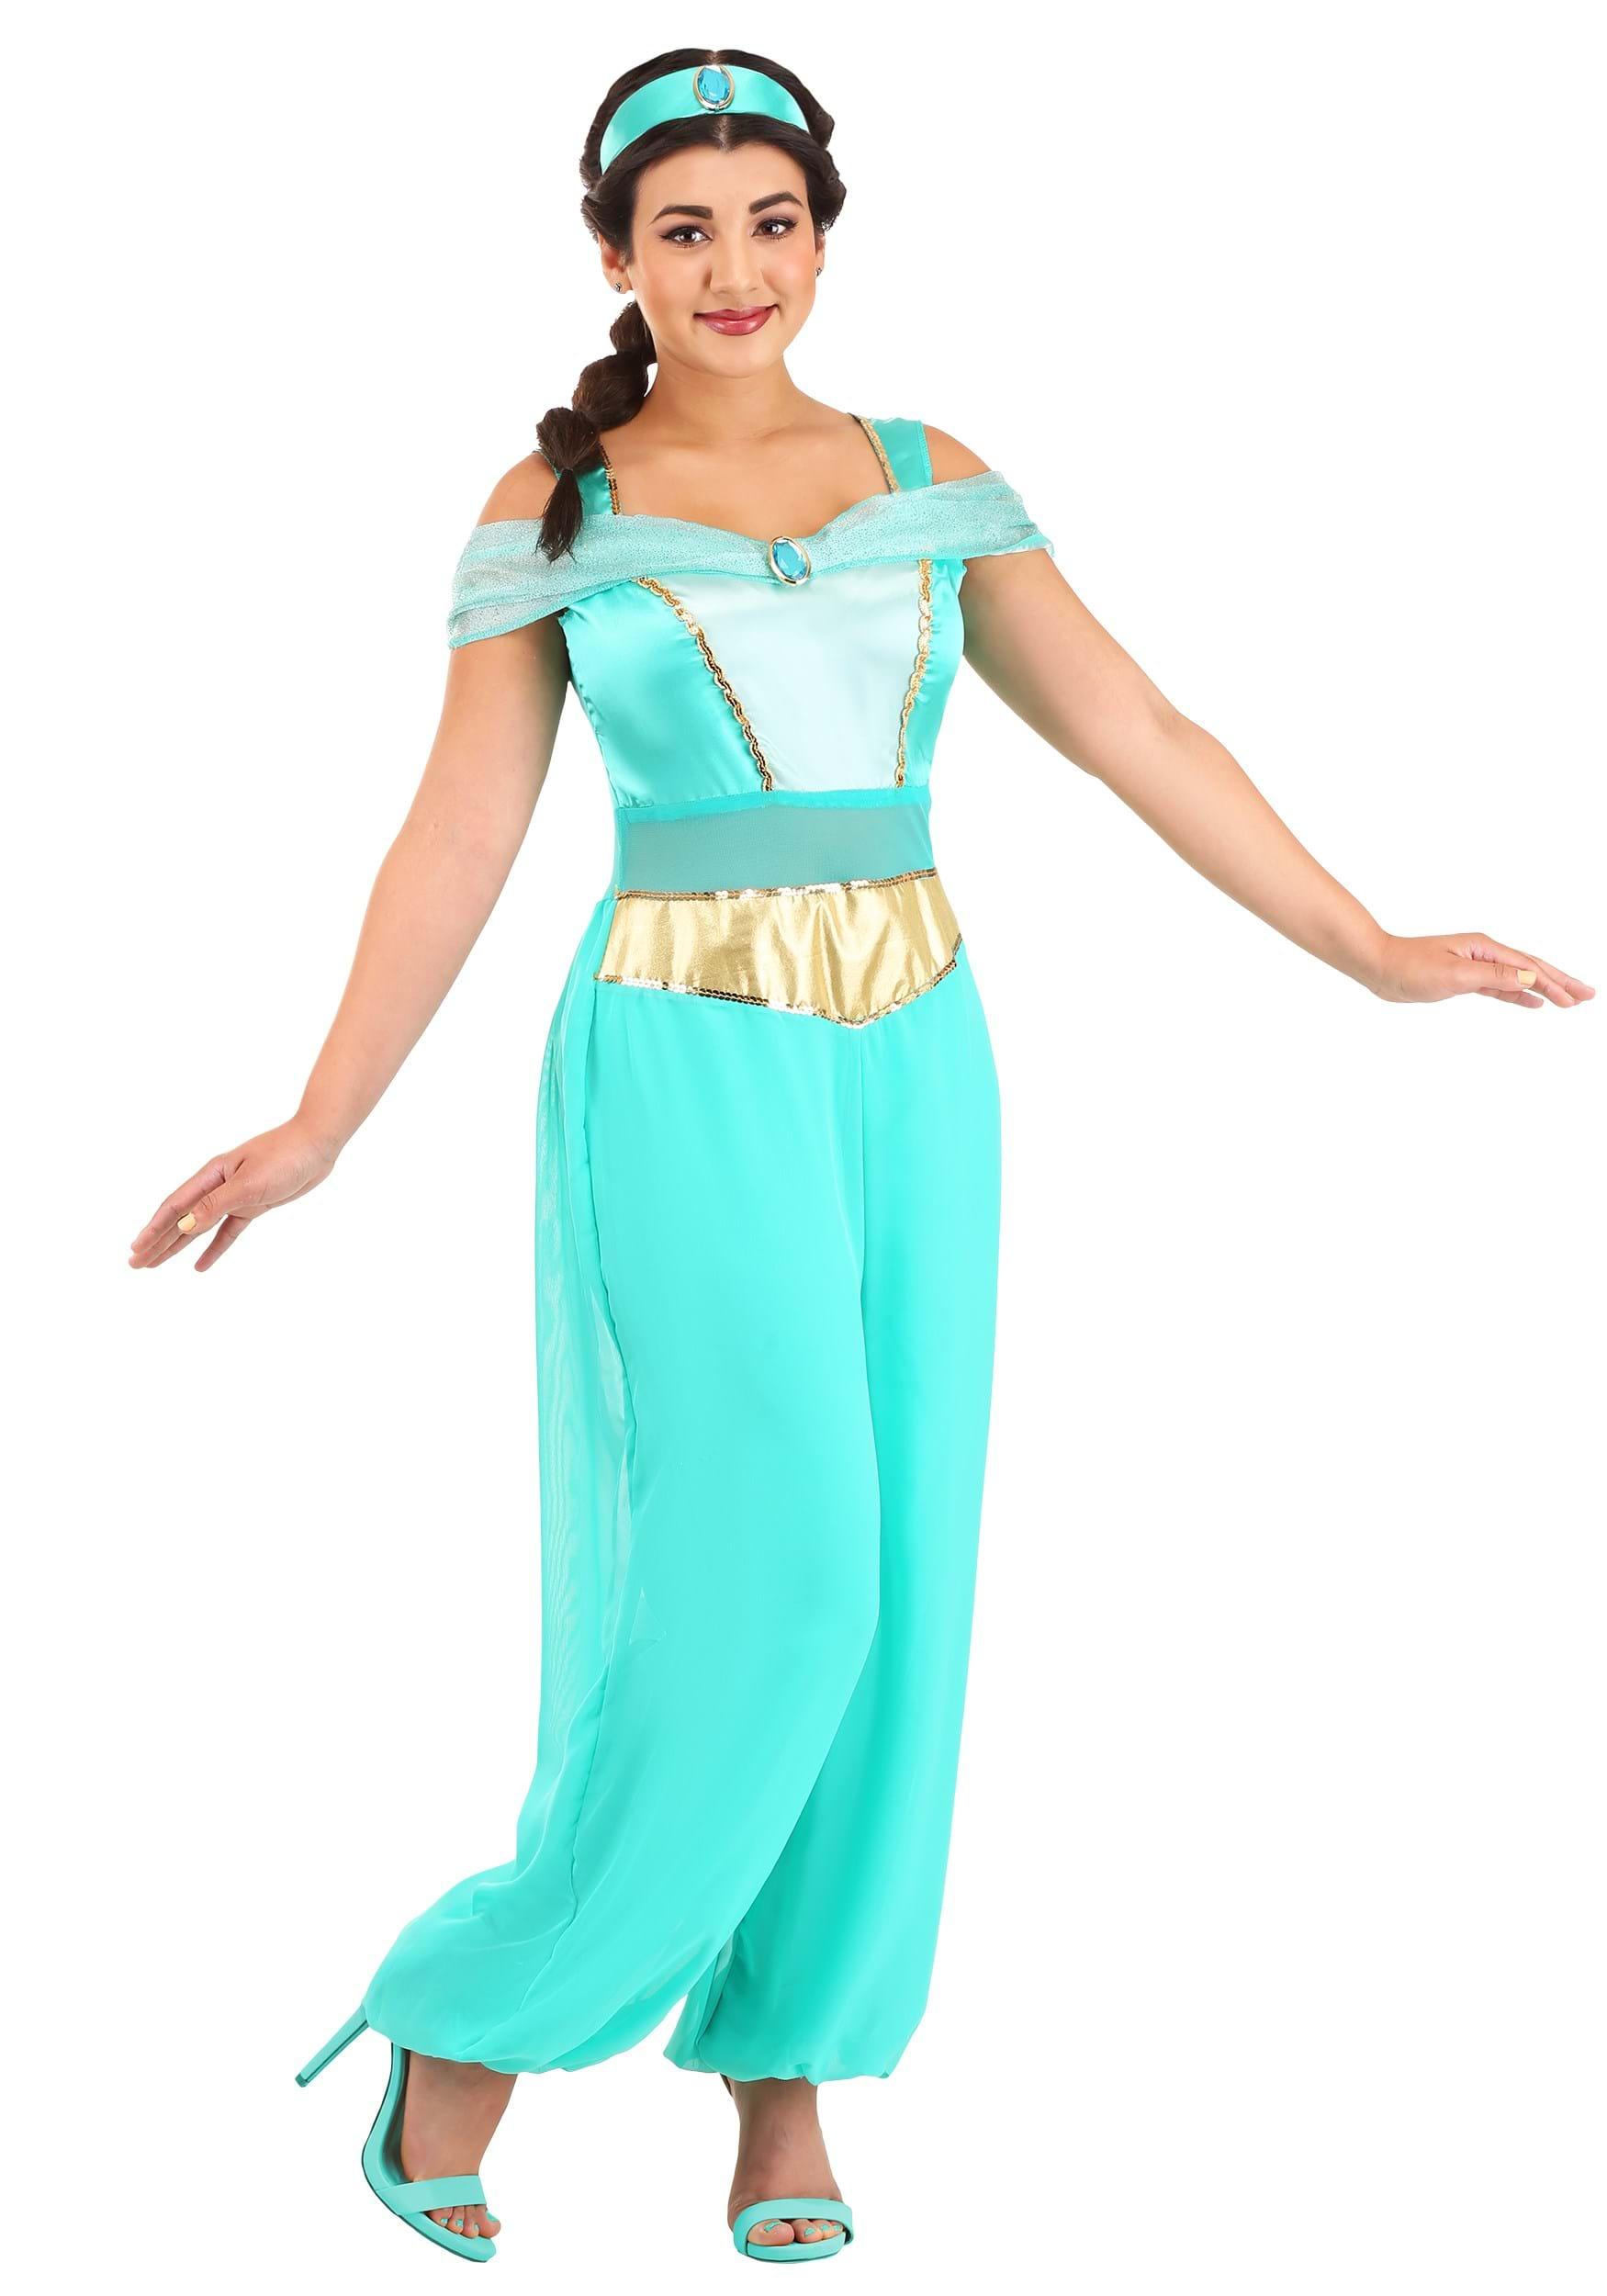 Womenu0027s Jasmine Deluxe Costume  sc 1 st  Halloween Costumes UK & Aladdin Costumes - Adult Kids Aladdin and Jasmine Costumes